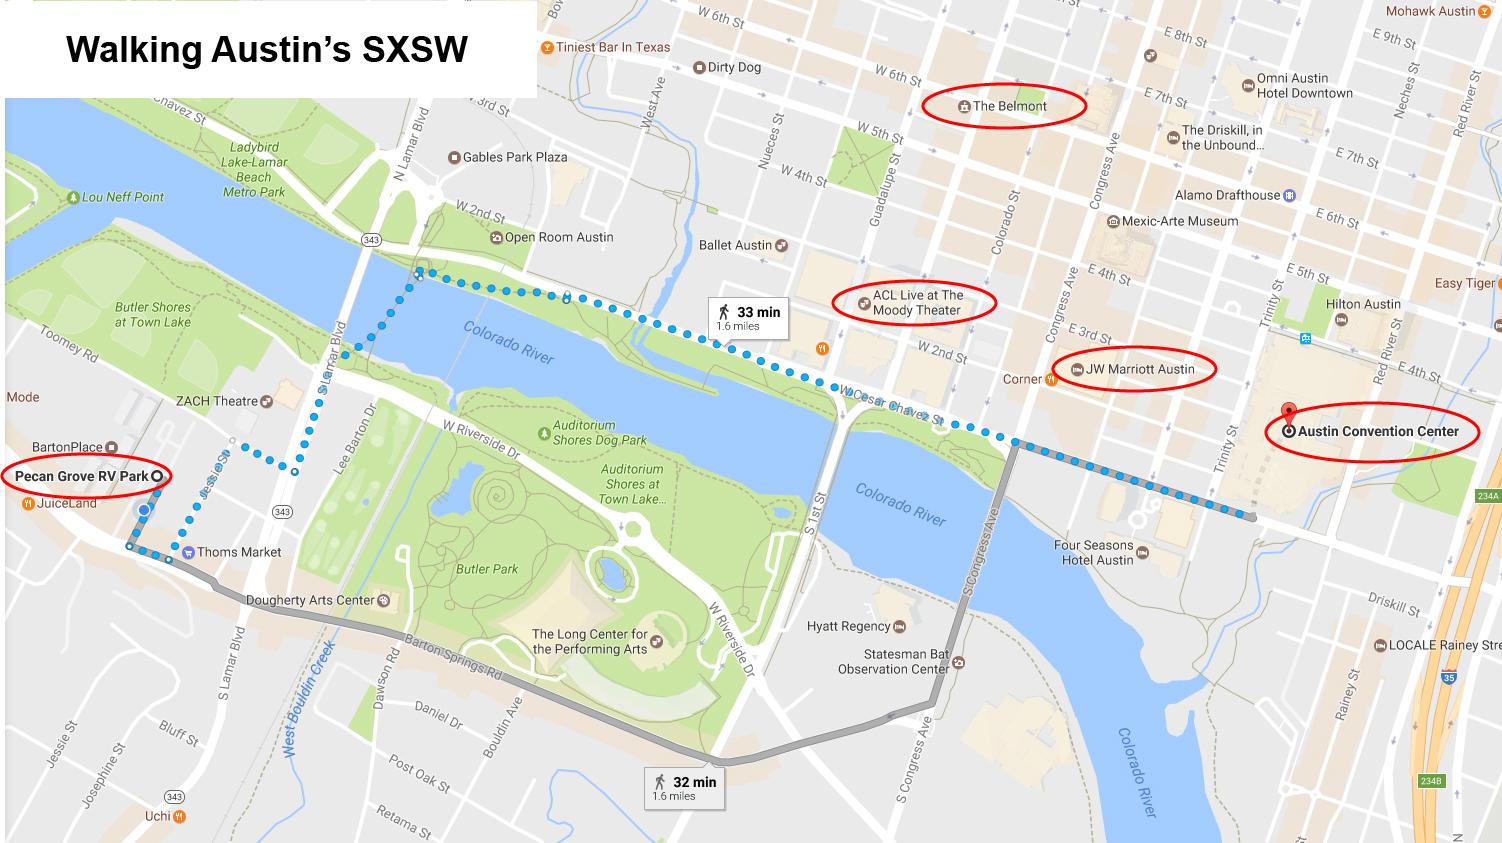 SXSW 2017   rvSeniorMoments Sxsw Map on live map, linkedin map, business map, culture map, marketing map, communication map, research map, love map, fashion map, networking map, food map, inspiration map, maker faire map, london map, fun map, tv map, coachella map, itunes map, sasquatch map, interactive map,